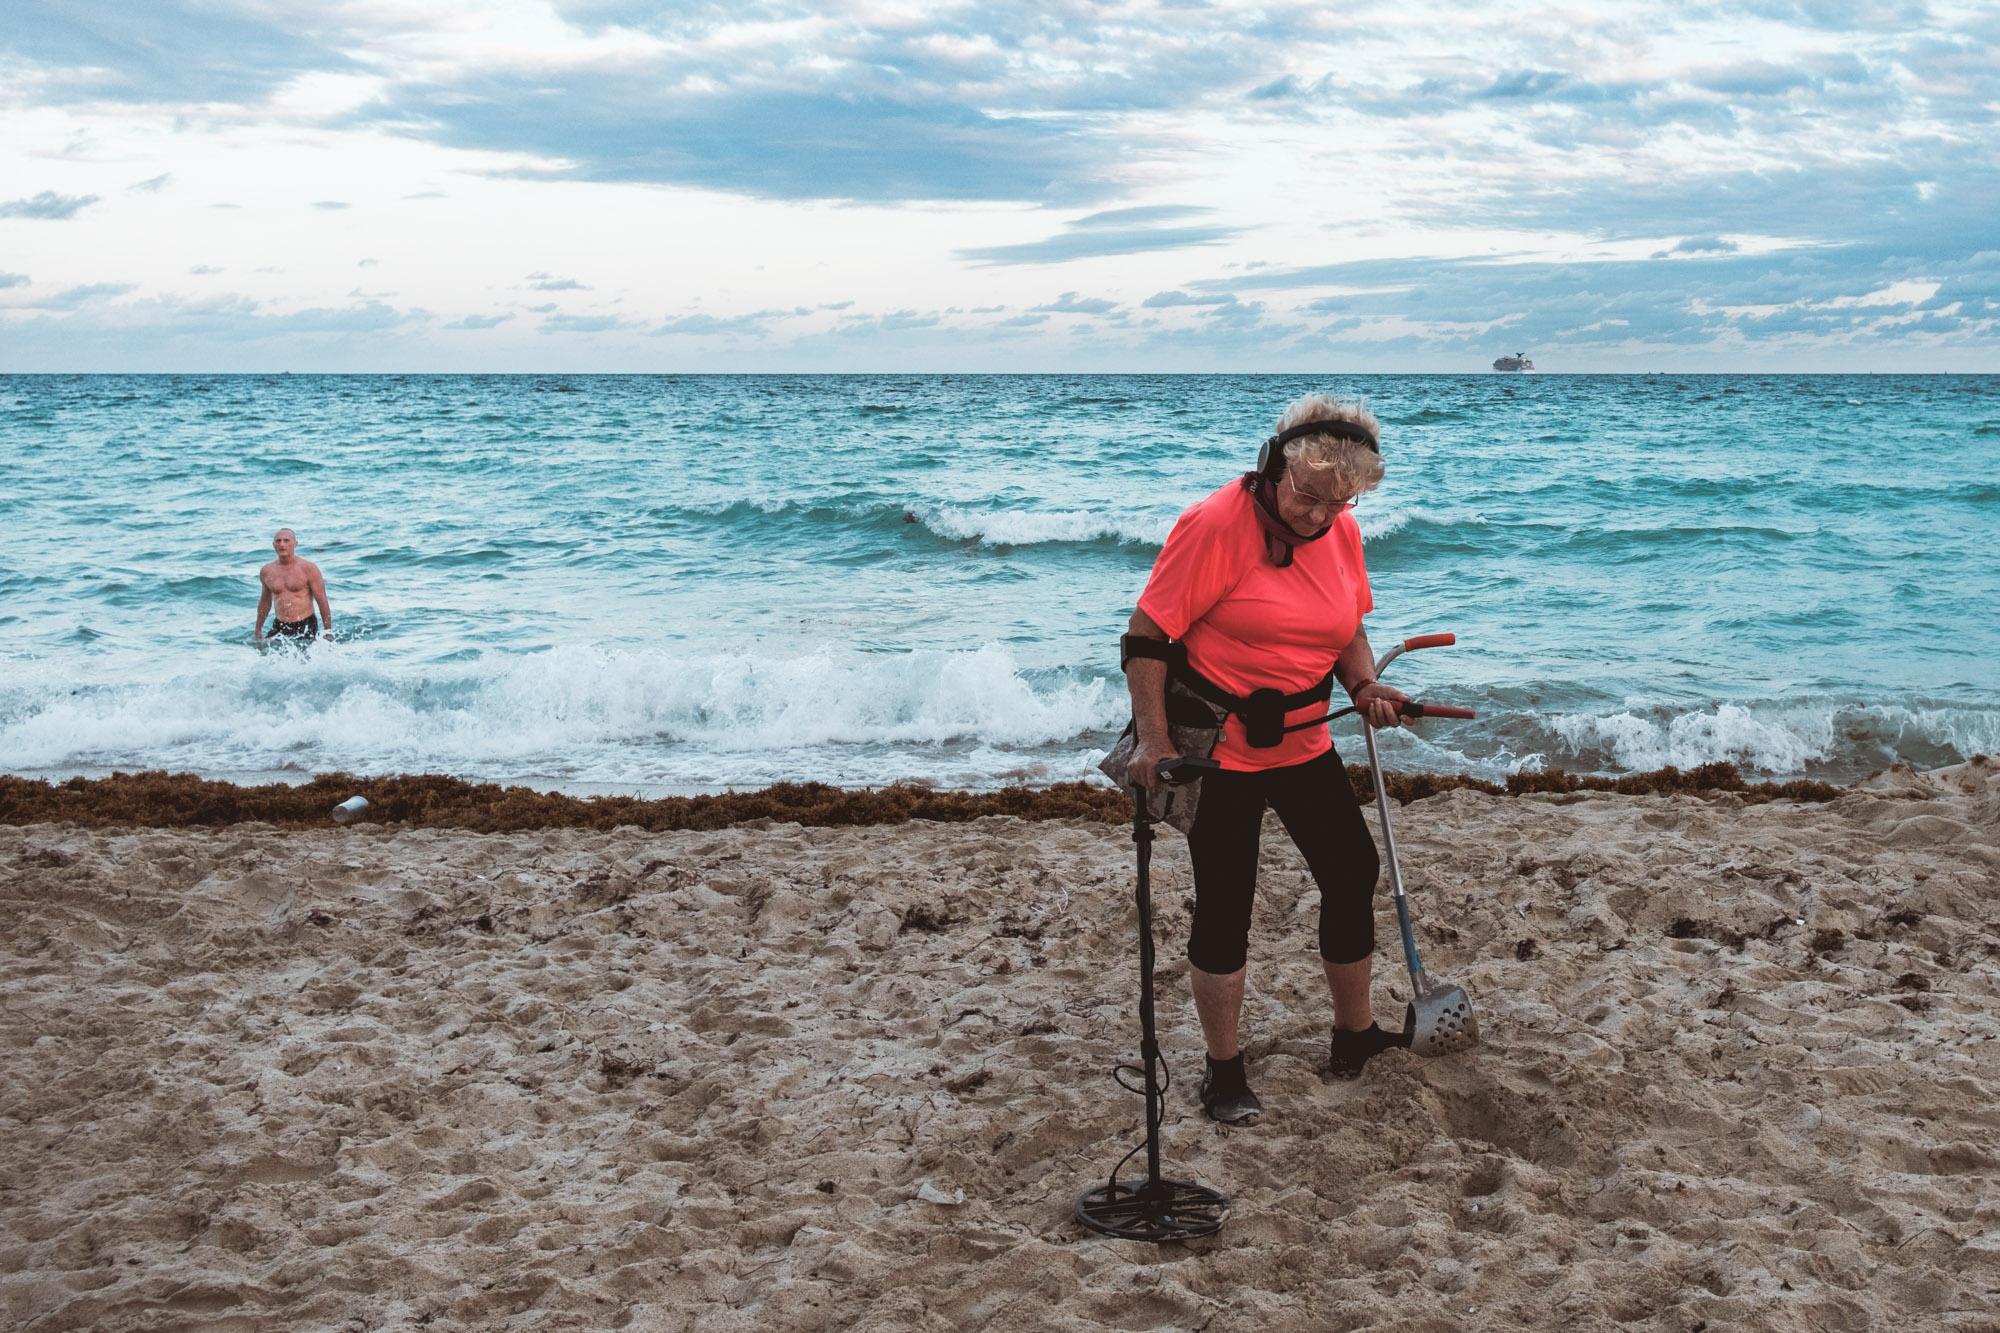 woman-searching-metal-detector-south-beach-miami-florida